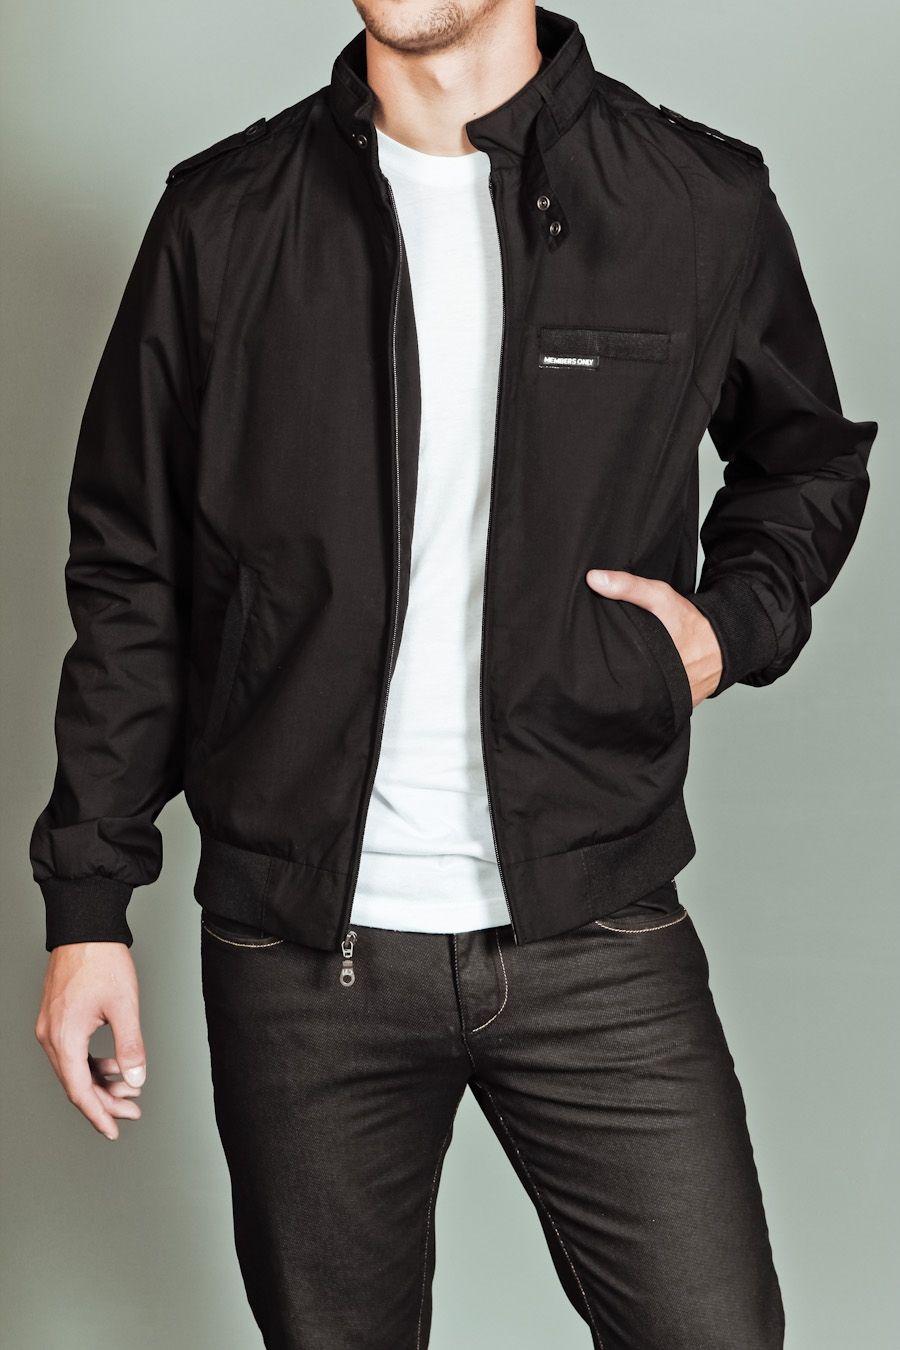 9c8607e976da Members Only- iconic racer jacket- jet black. | Style Savvy ...